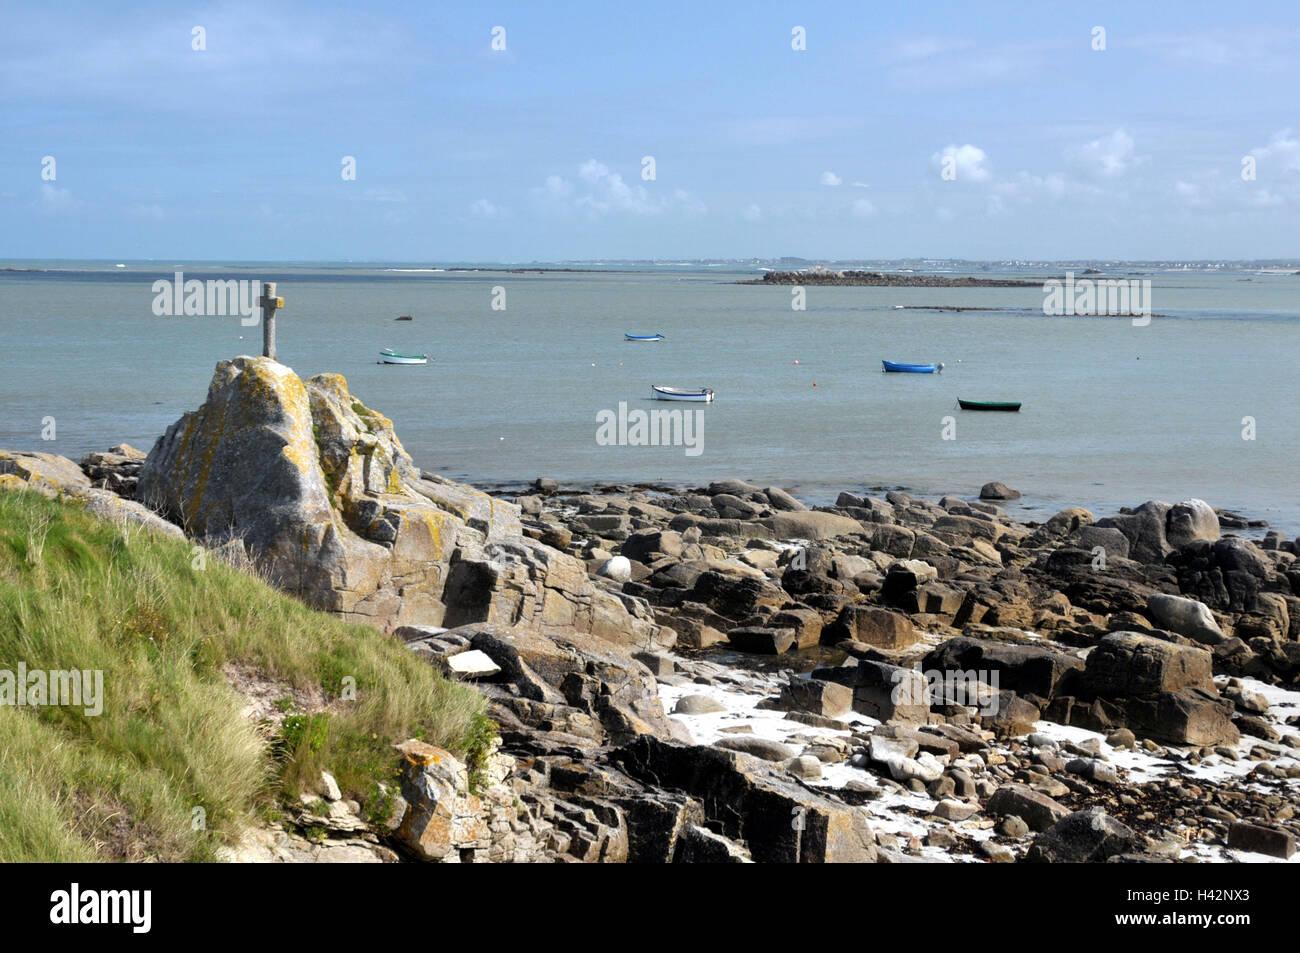 France, Brittany, pest de Lividic, bile coast, - Stock Image